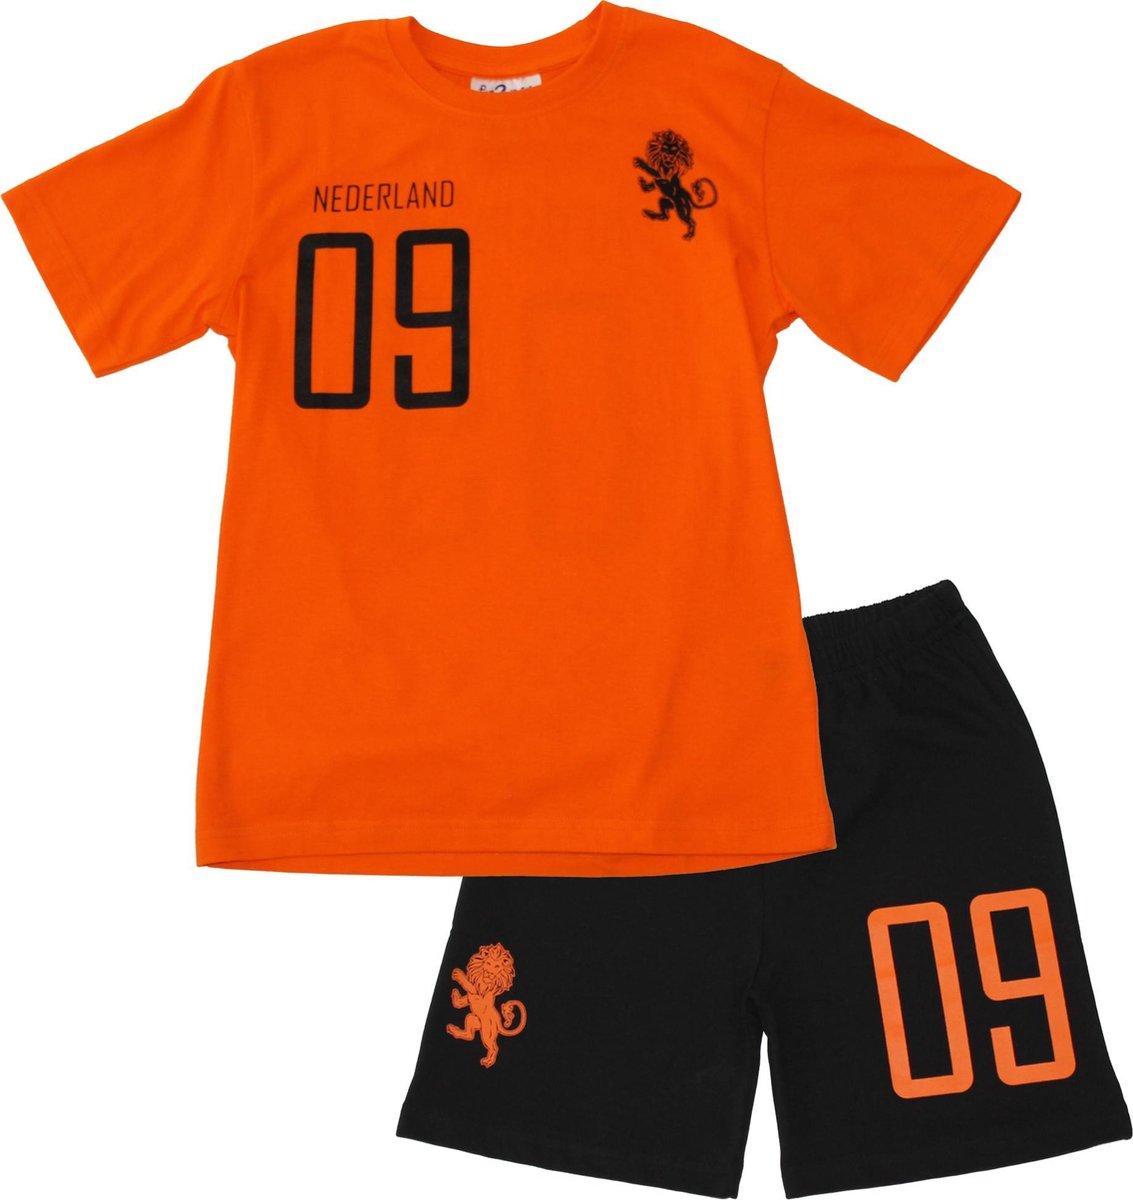 Fun2wear Shortama Elftal Oranje Zwart - maat 116